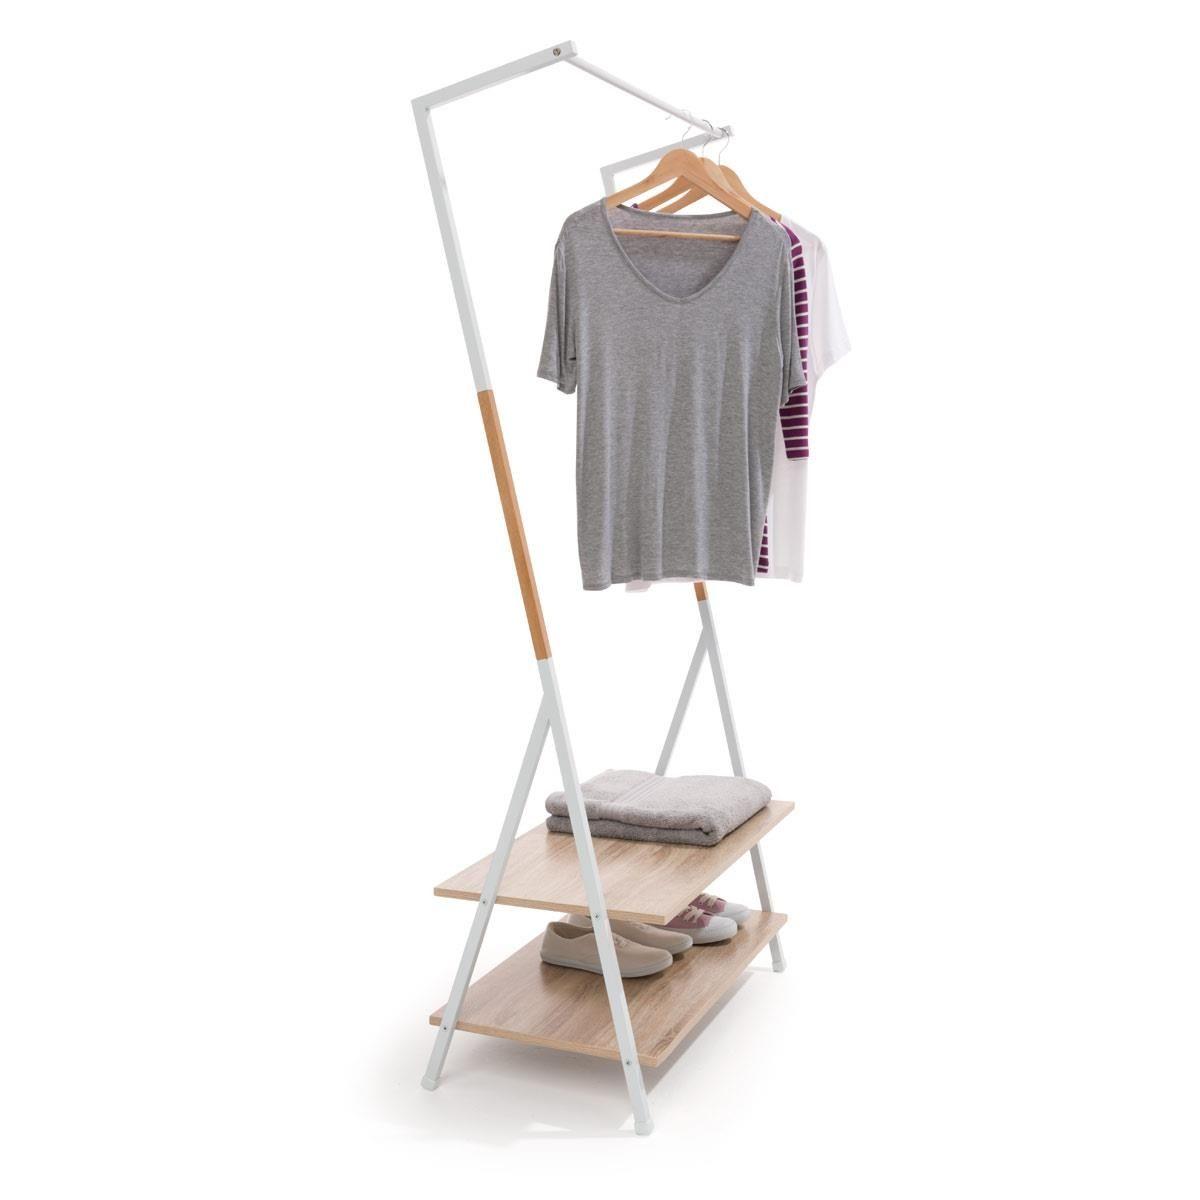 Mini Clothes Rack Kmart Bamboo Towel Rail Wooden Hangers Fur Rug Kmart Hacks Kids Clothing Rack Kids Clothes Storage